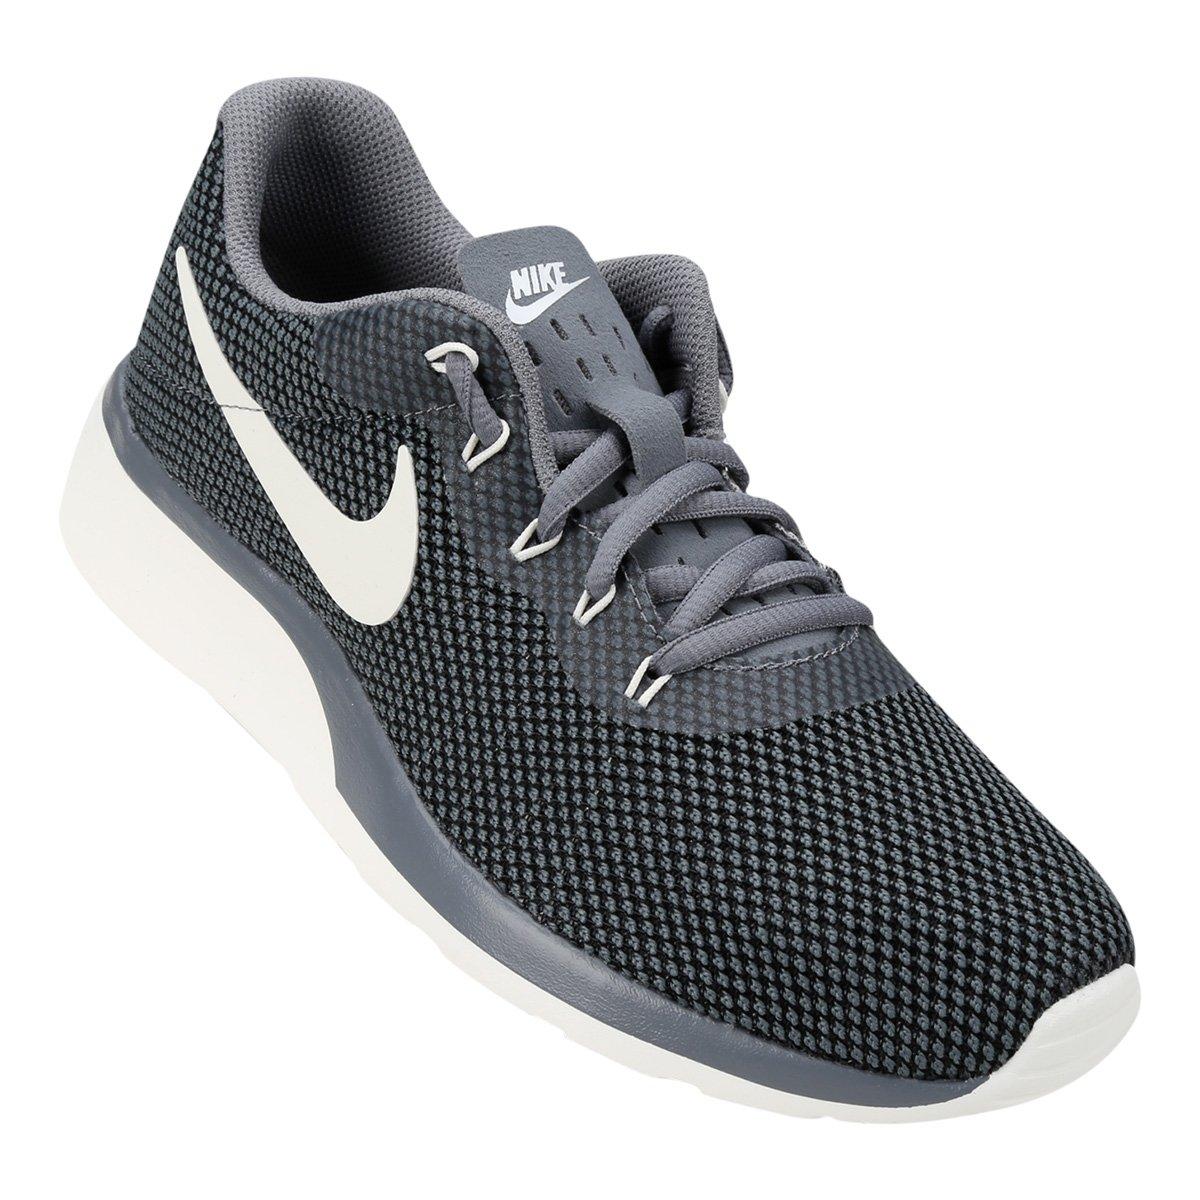 8ff37feea Tênis Nike Tanjun Racer Feminino - Compre Agora